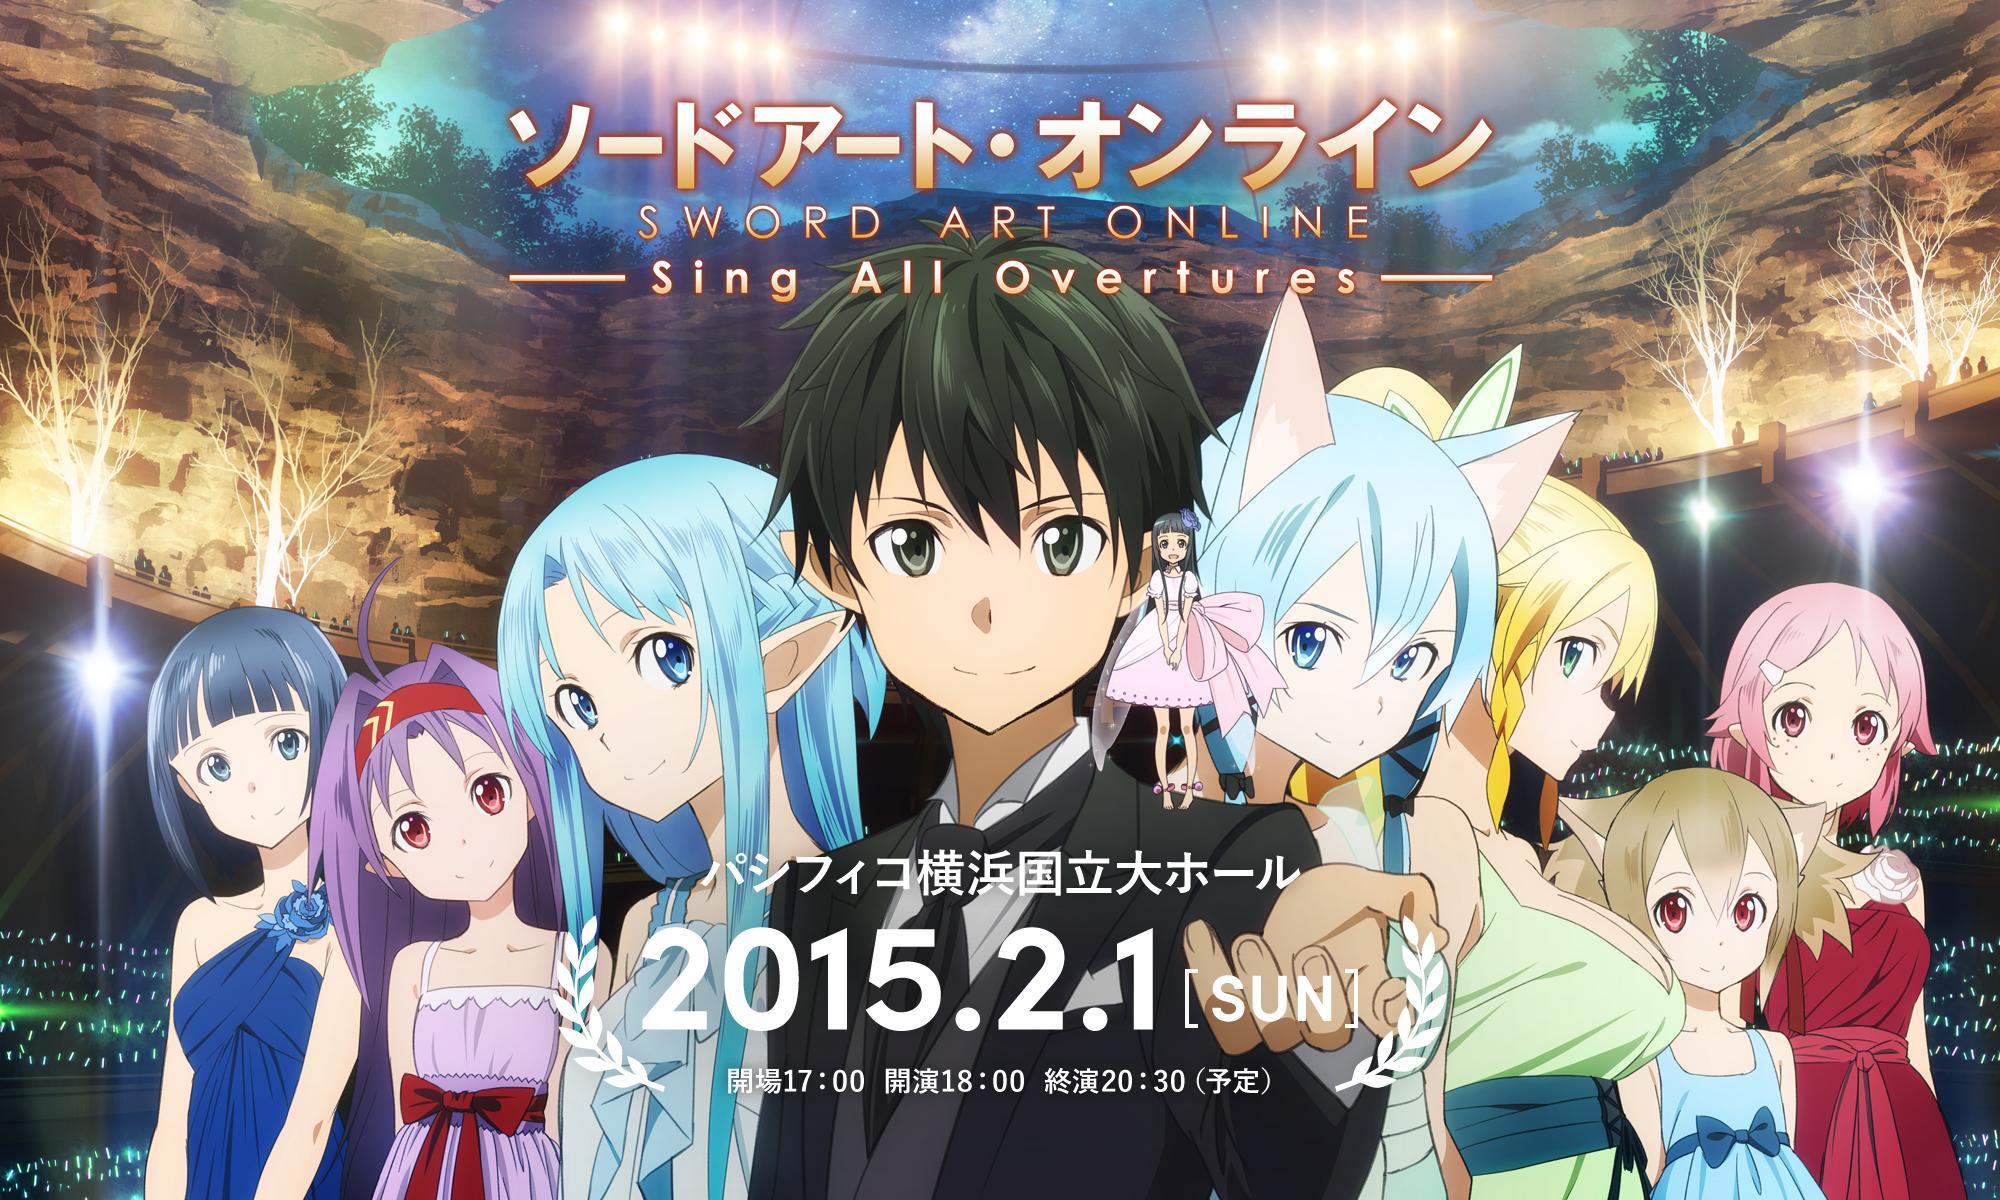 Sword Art Online Sing All Overtures Concert Merchandise and Visual Previewed haruhichan.com Sword Art Online Concert visual SAO